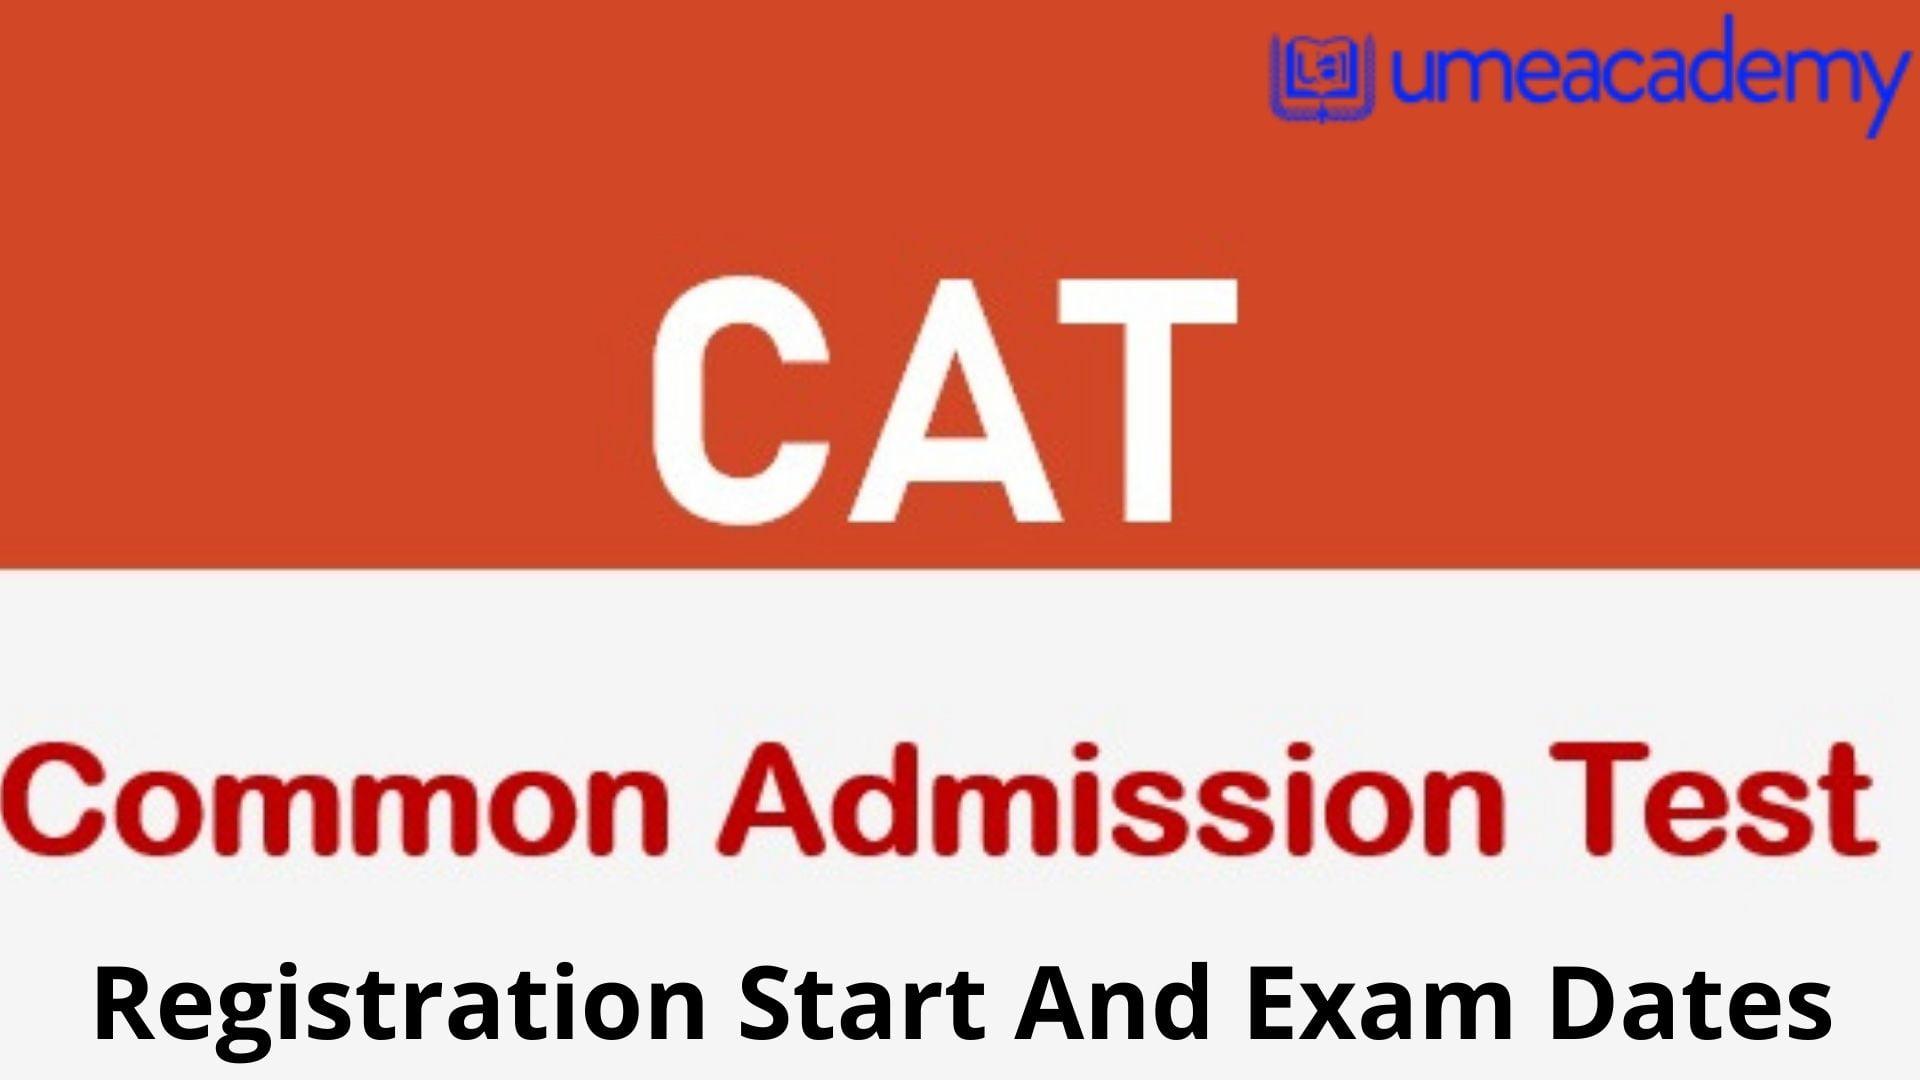 CAT 2022 Registration Start